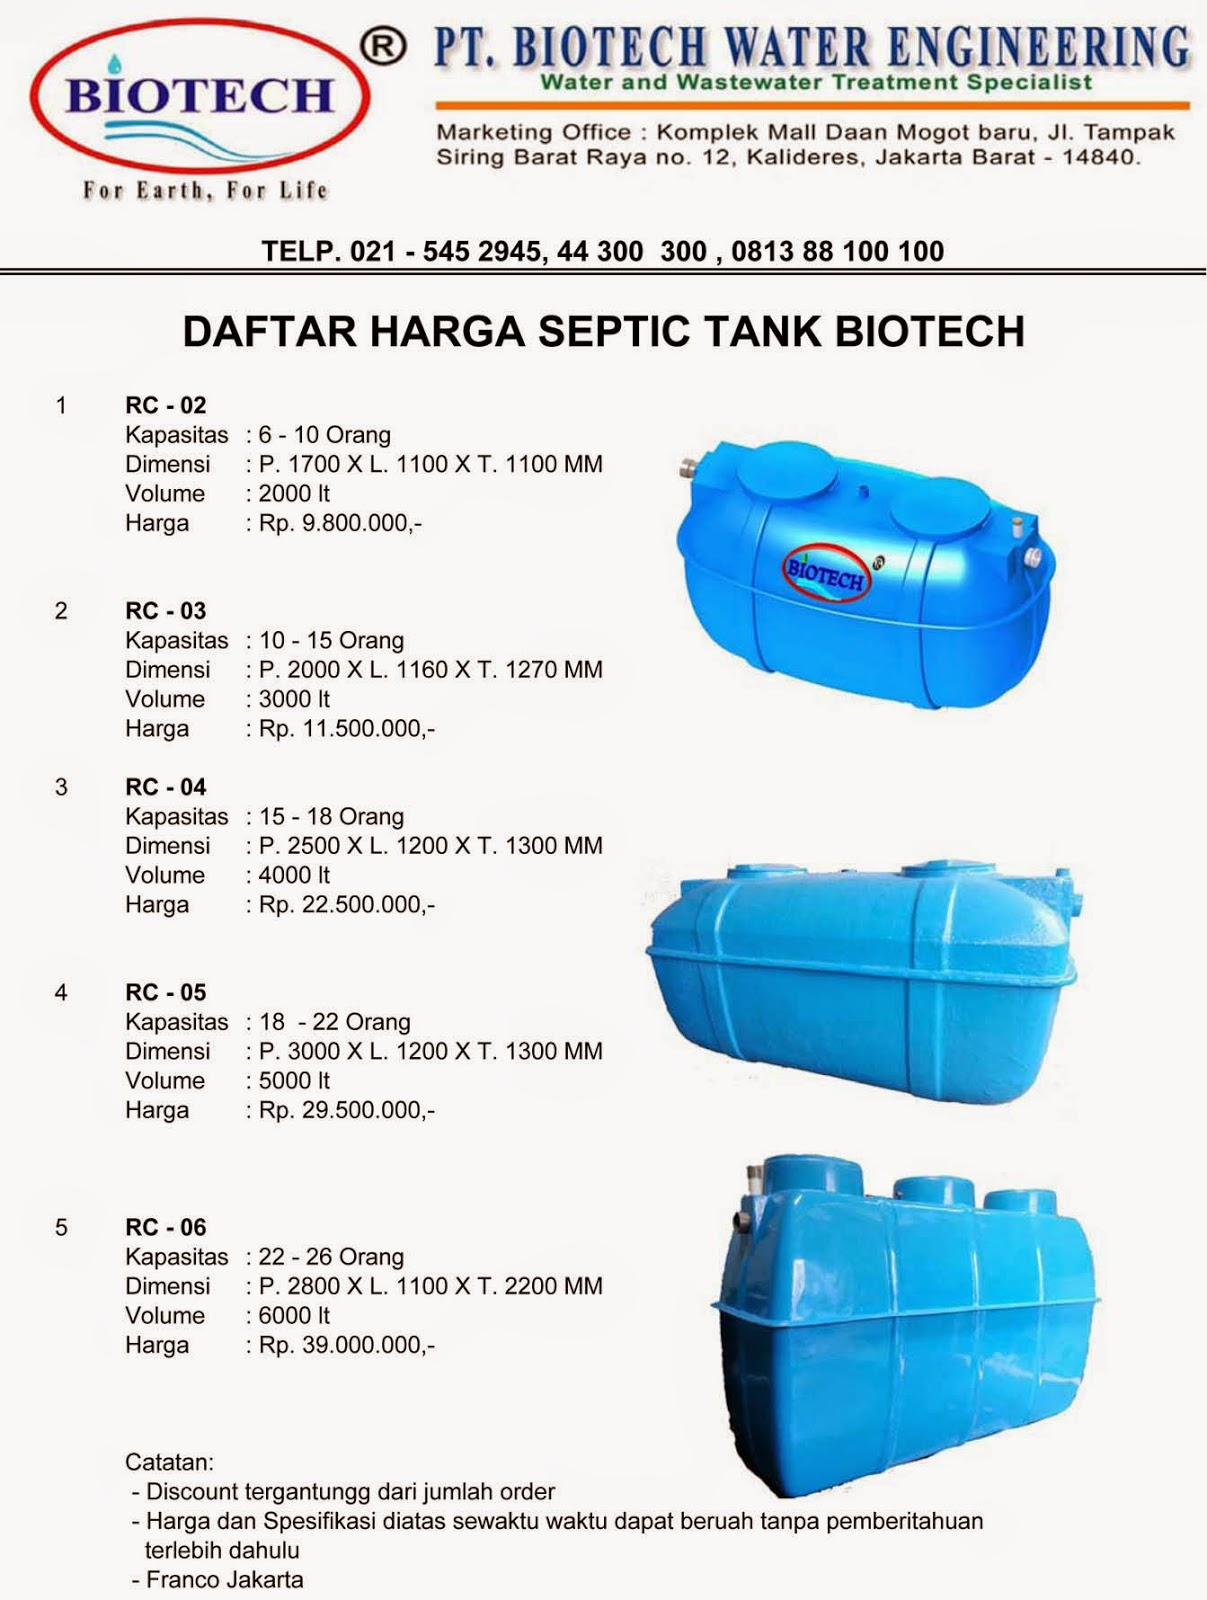 daftar harga septic tank biotech, bt series, sepiteng, ipal, stp, biofive, biogift, induro, biofil